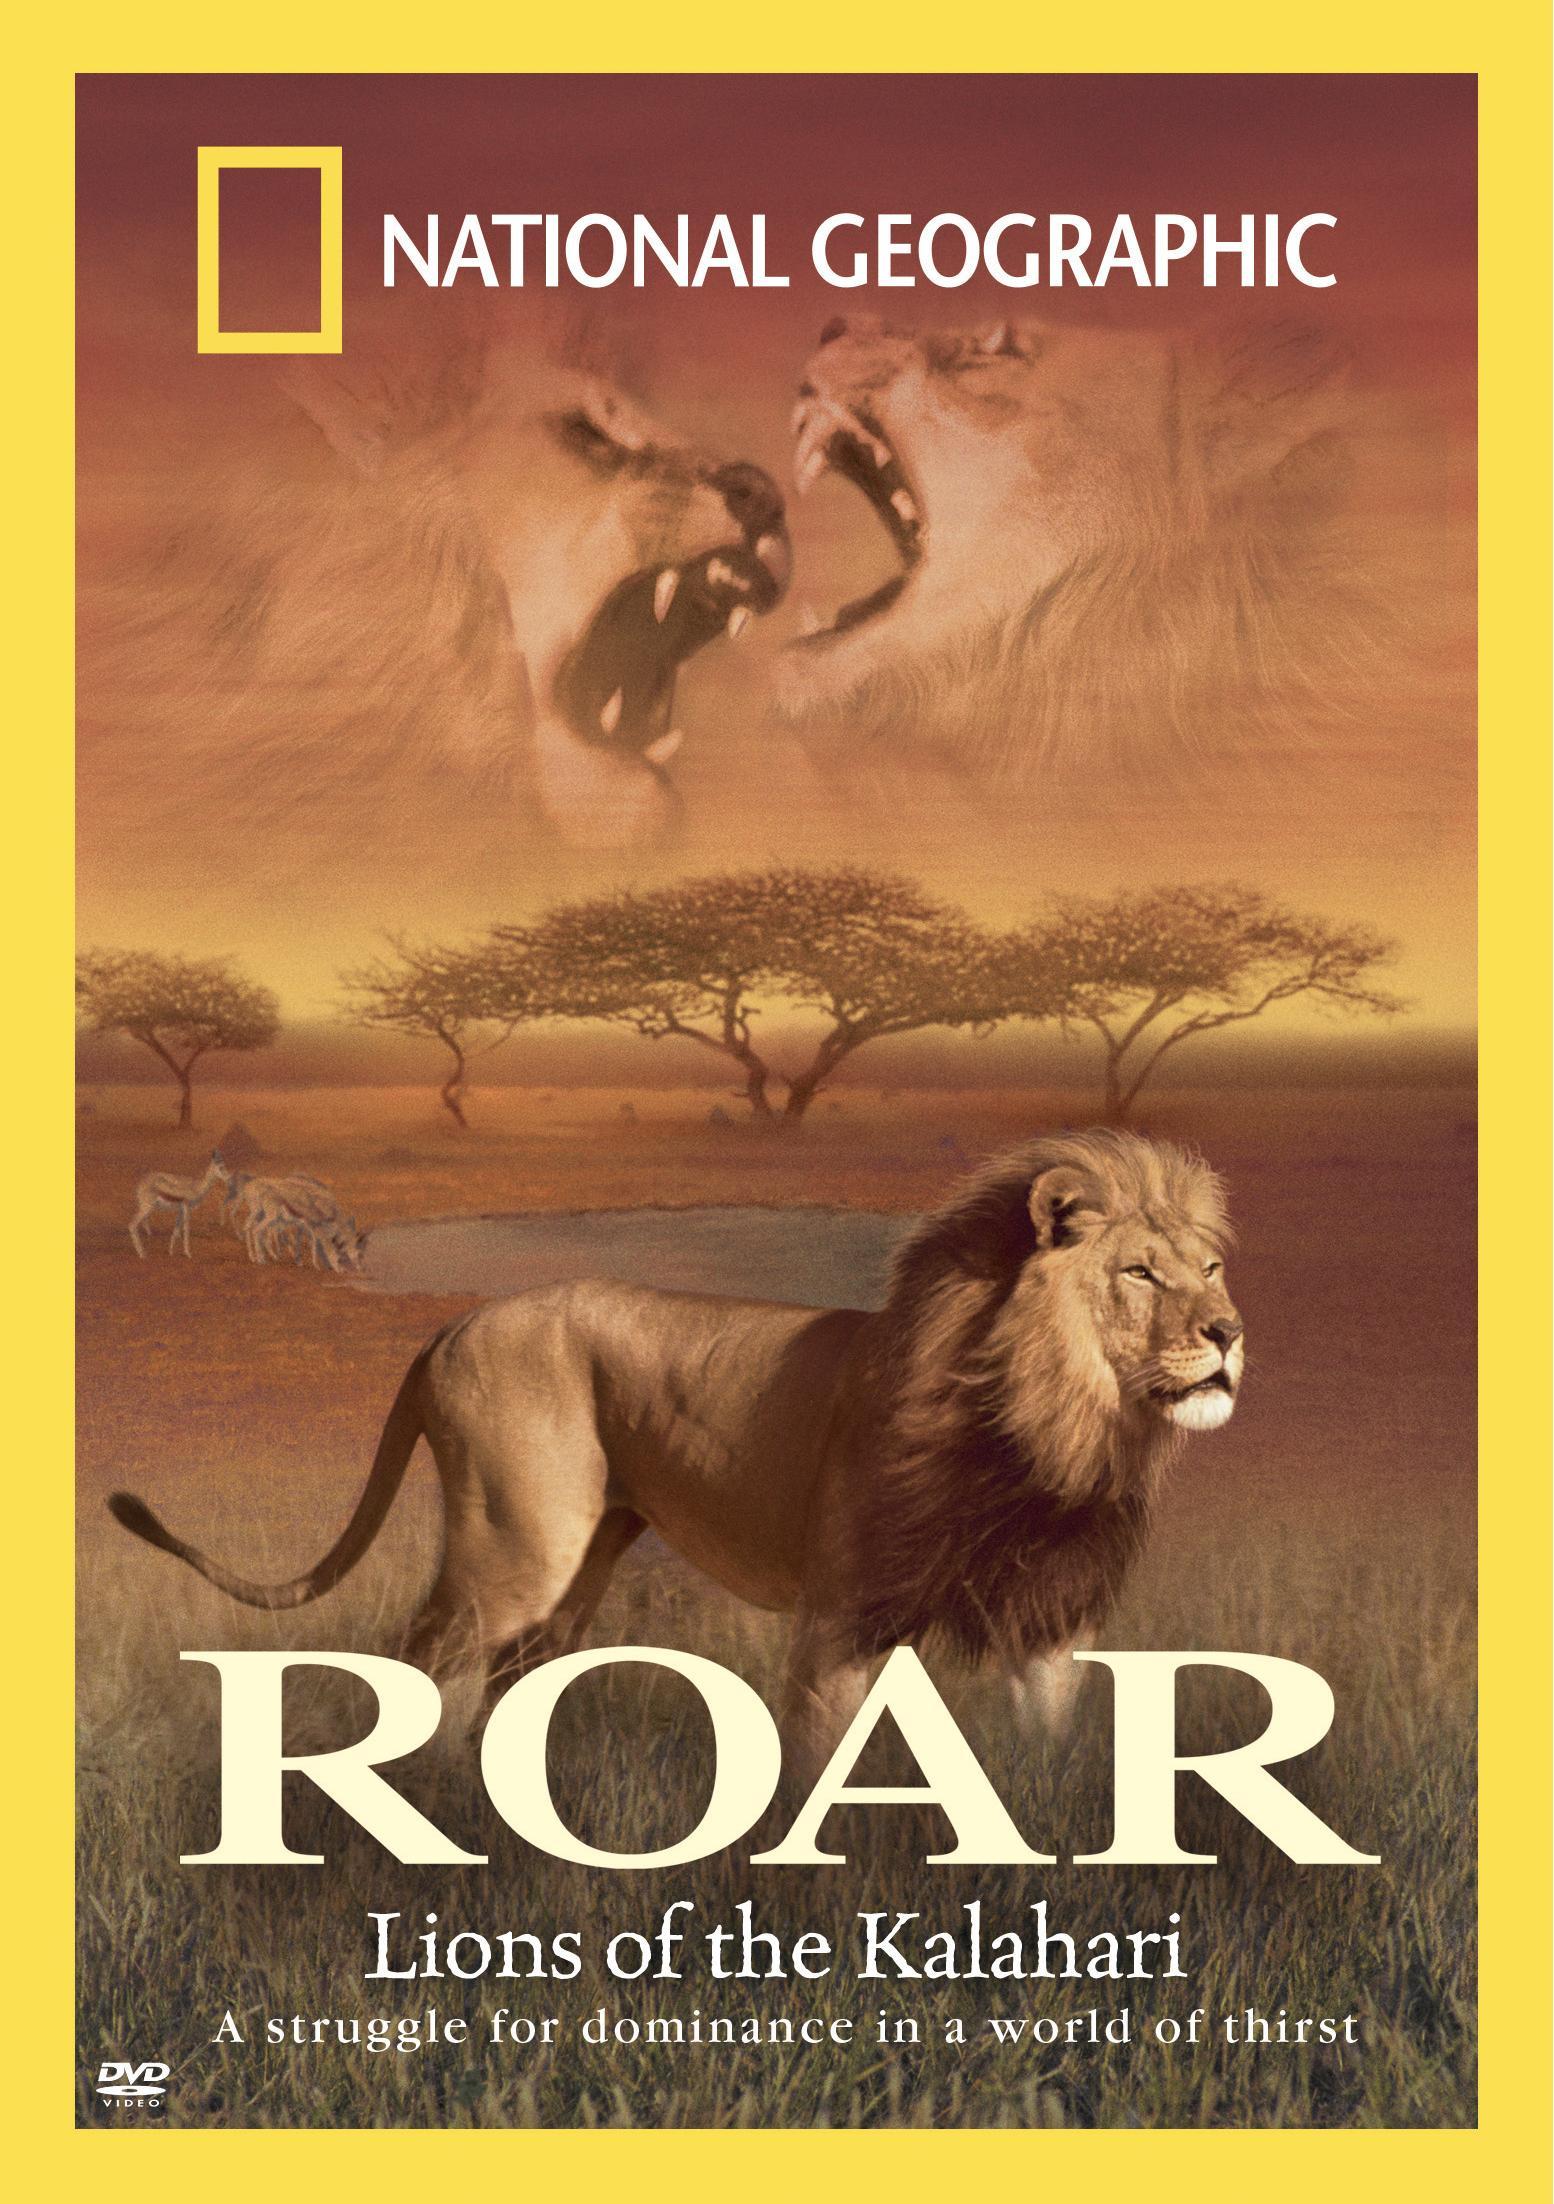 National Geographic: Roar - Lions of the Kalahari